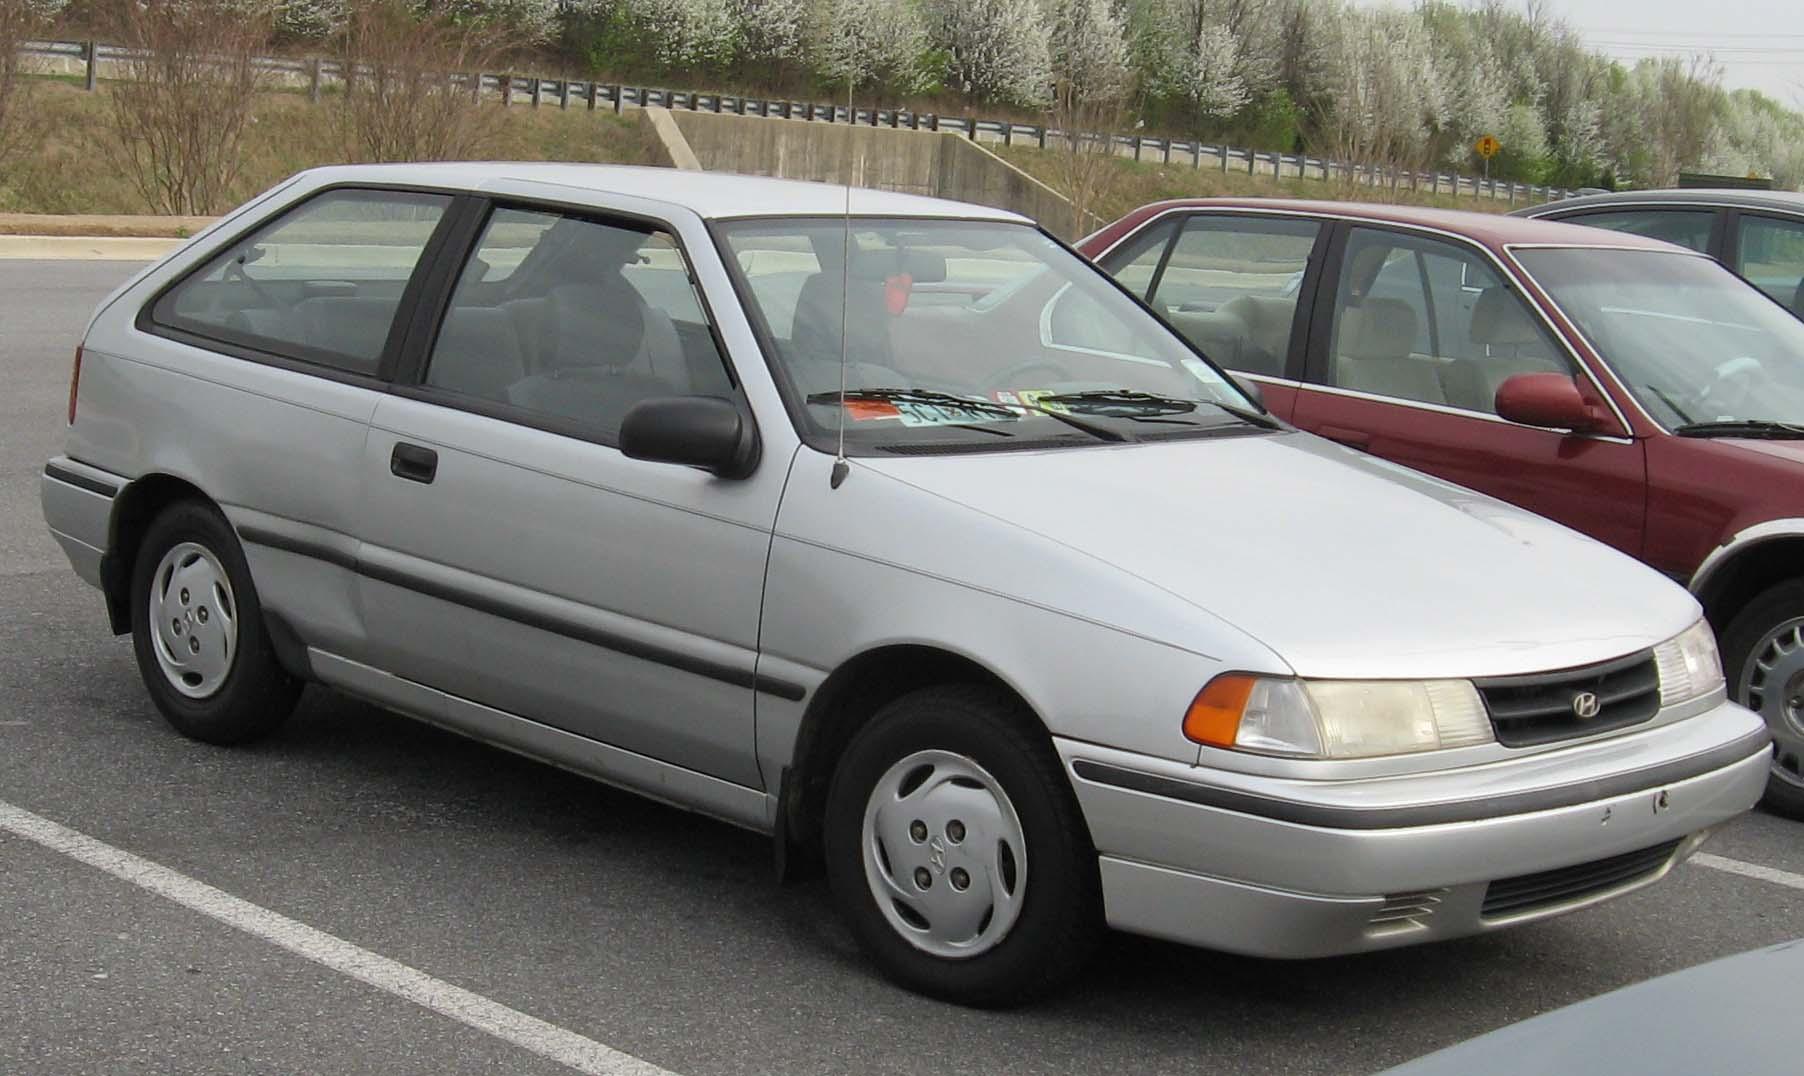 File:92-94 Hyundai Excel.jpg - Wikimedia Commons